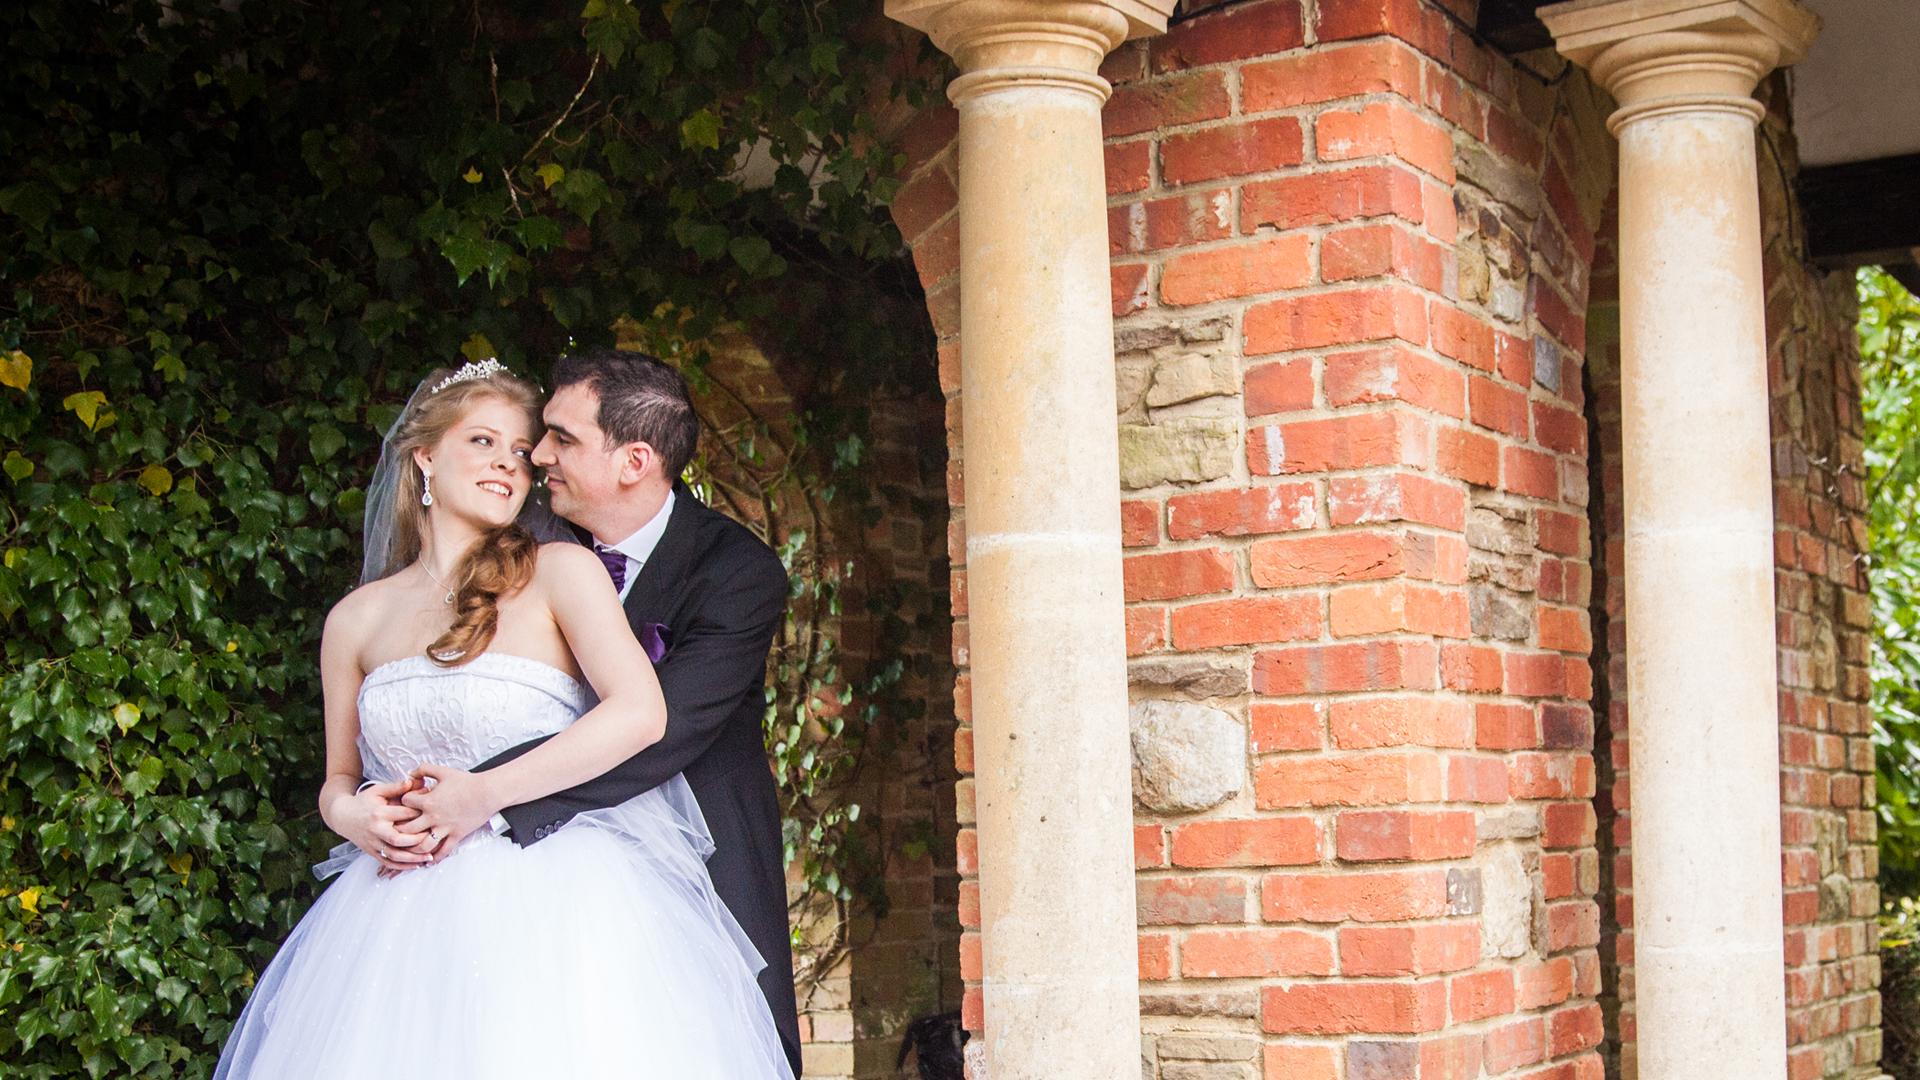 ghyll-manor-wedding-feature2.jpg